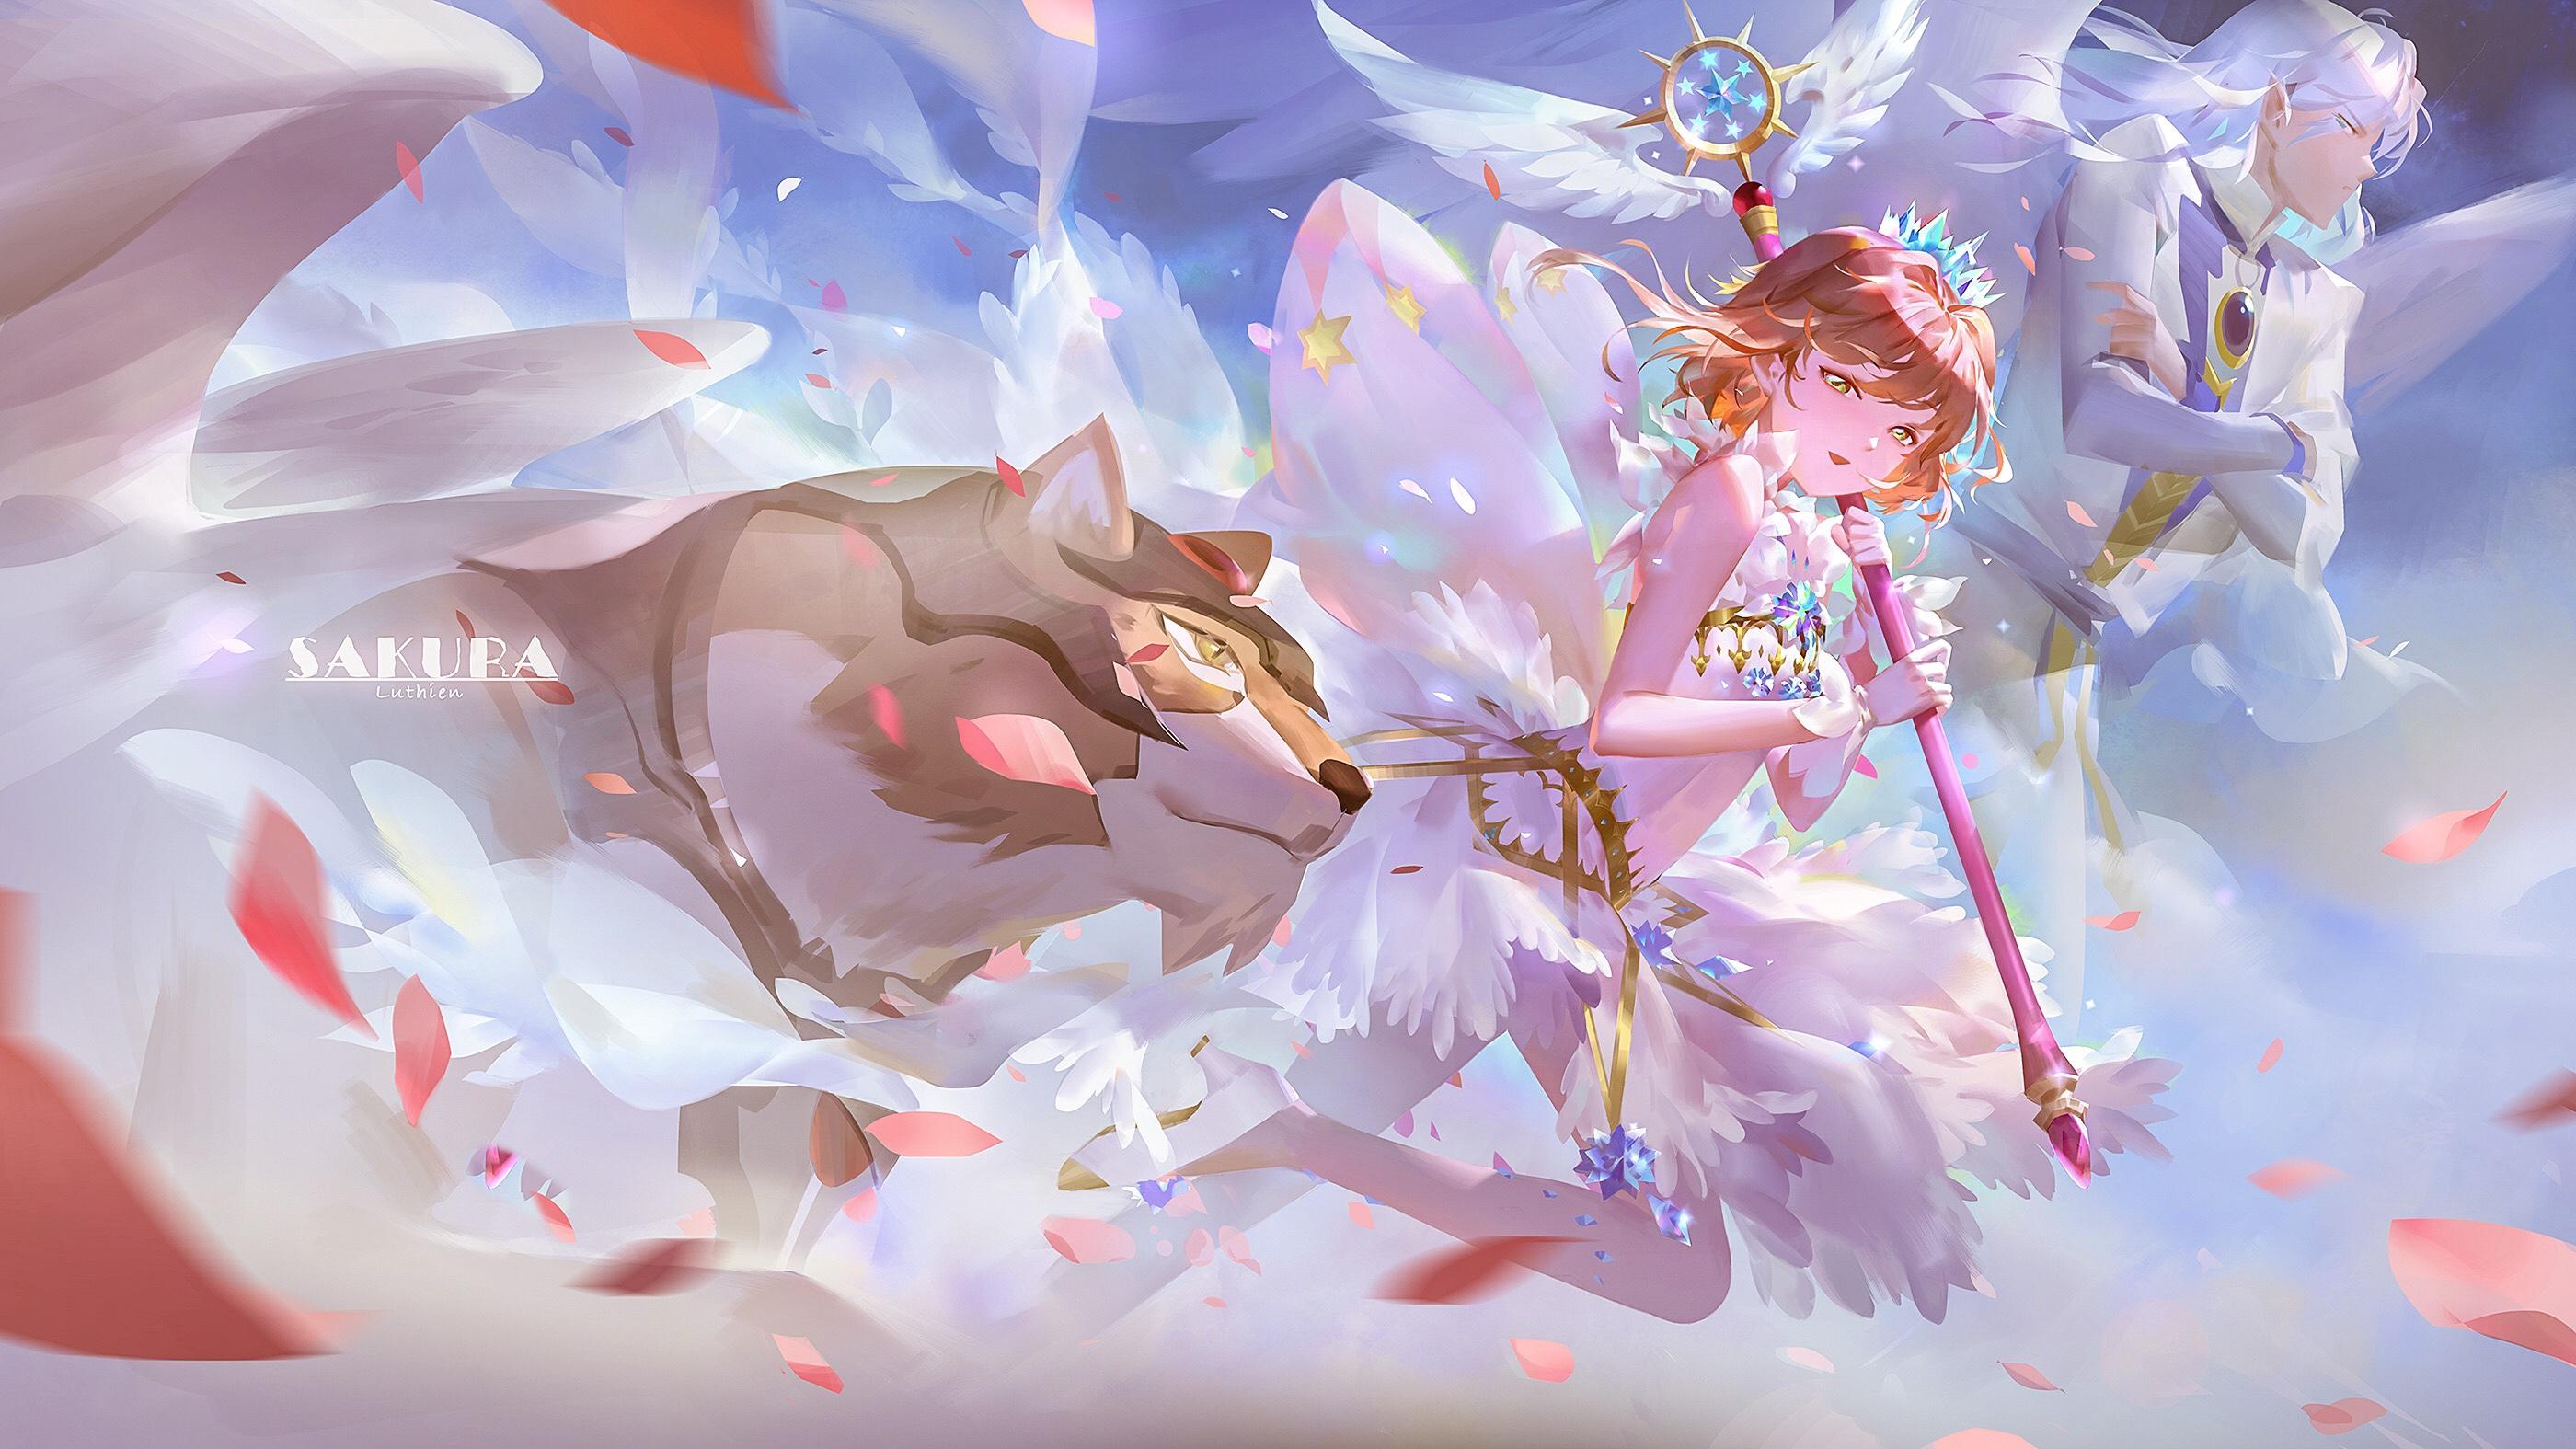 Kerberos fanart zerochan anime image board - Cardcaptor sakura wallpaper ...